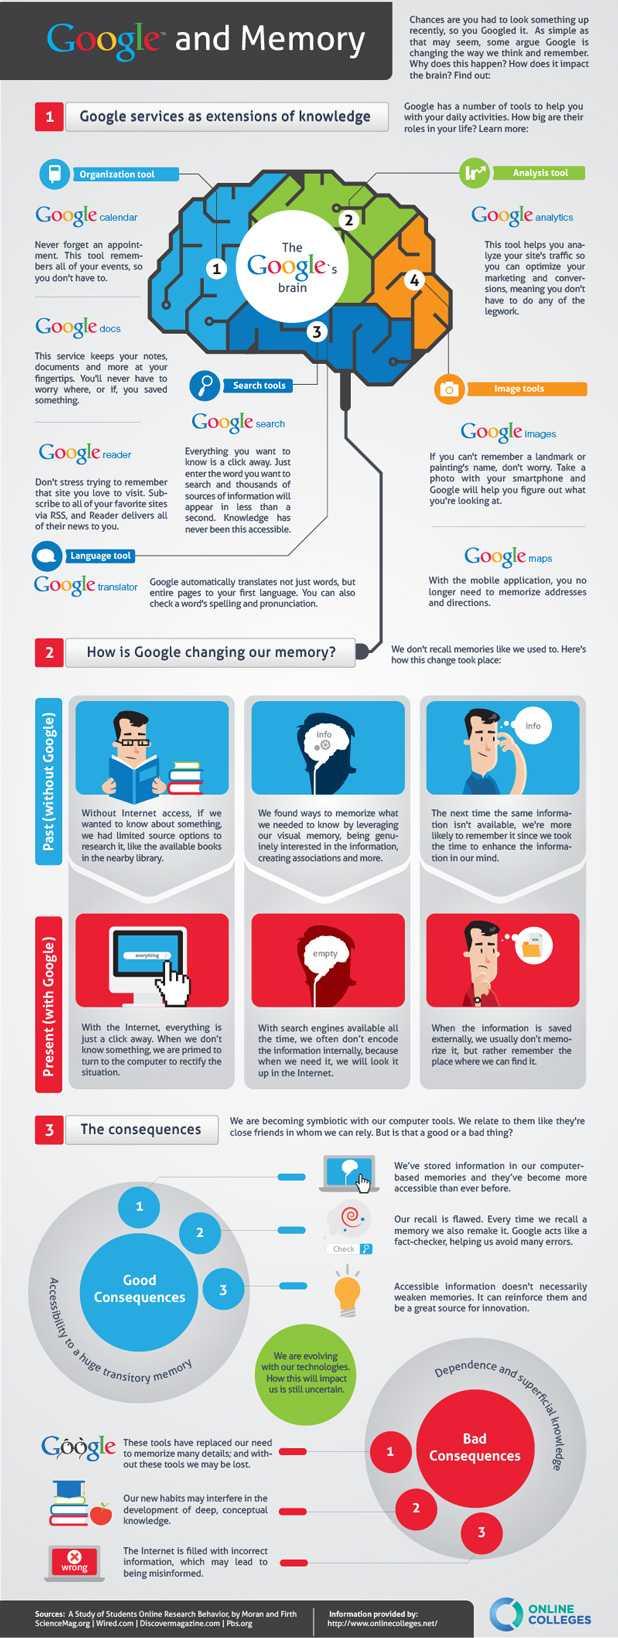 Google ne distruge memoria